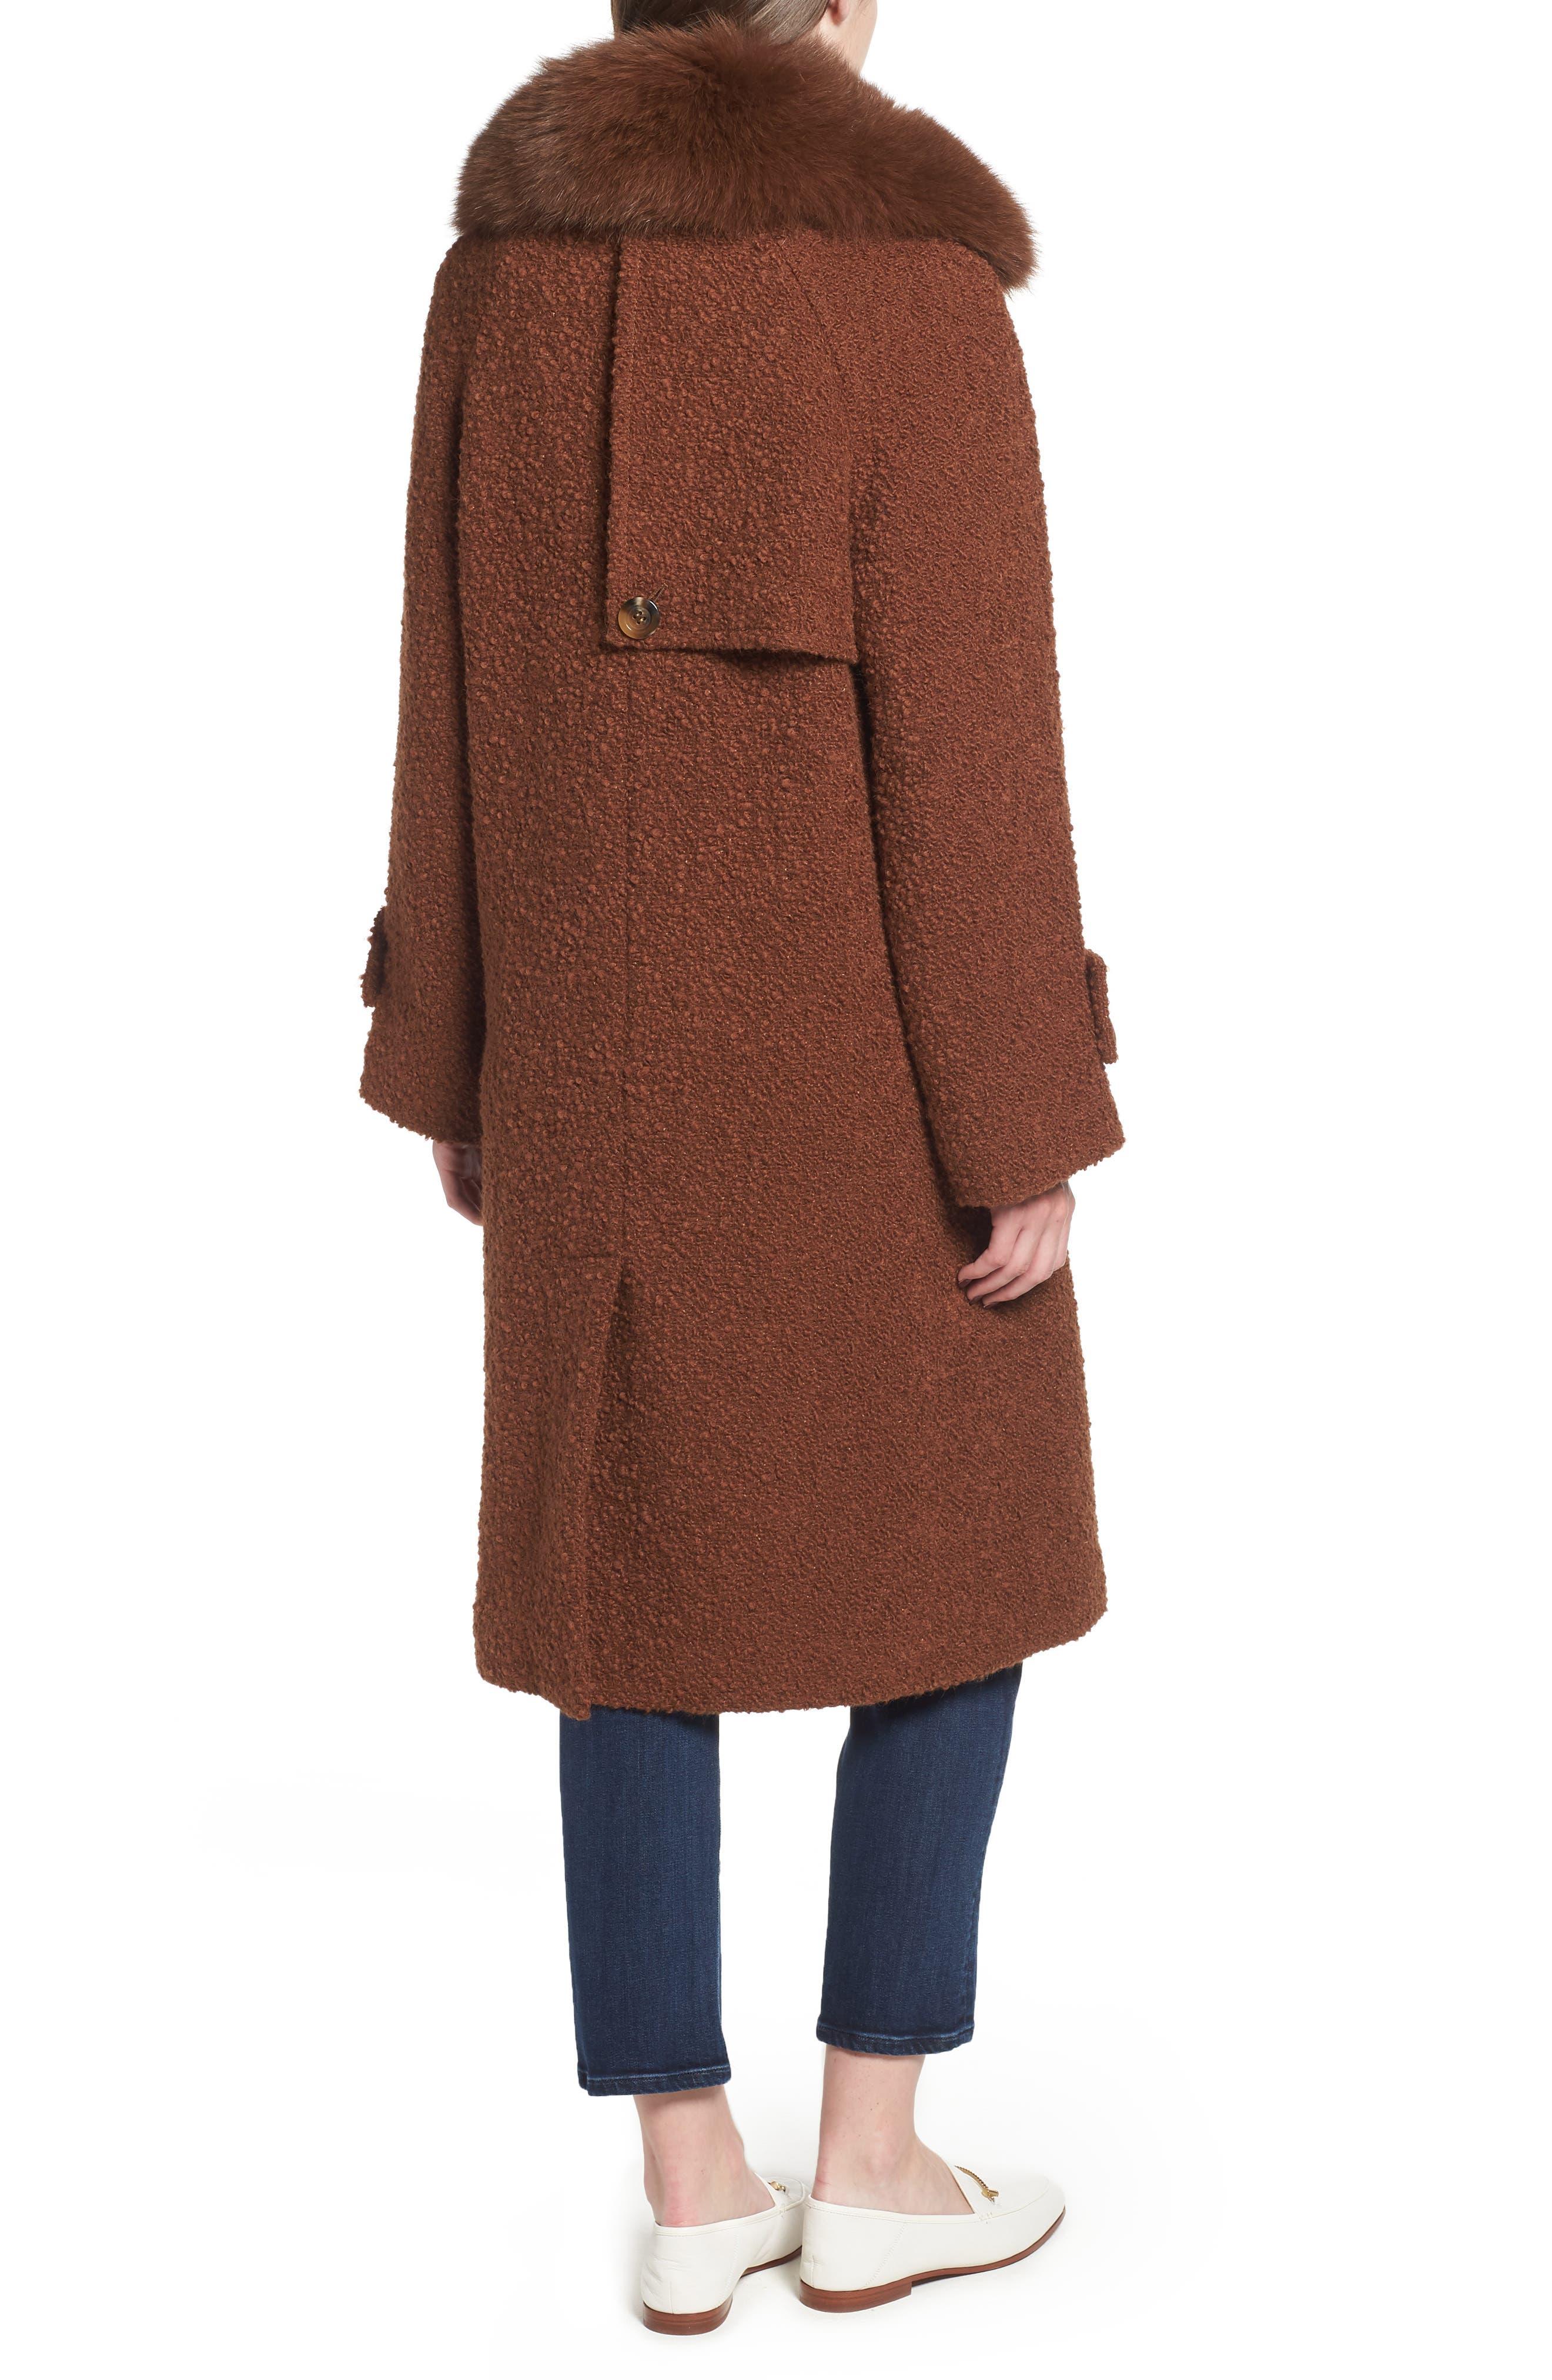 London Genuine Fox Fur Trim Long Coat,                             Alternate thumbnail 2, color,                             MOCHA